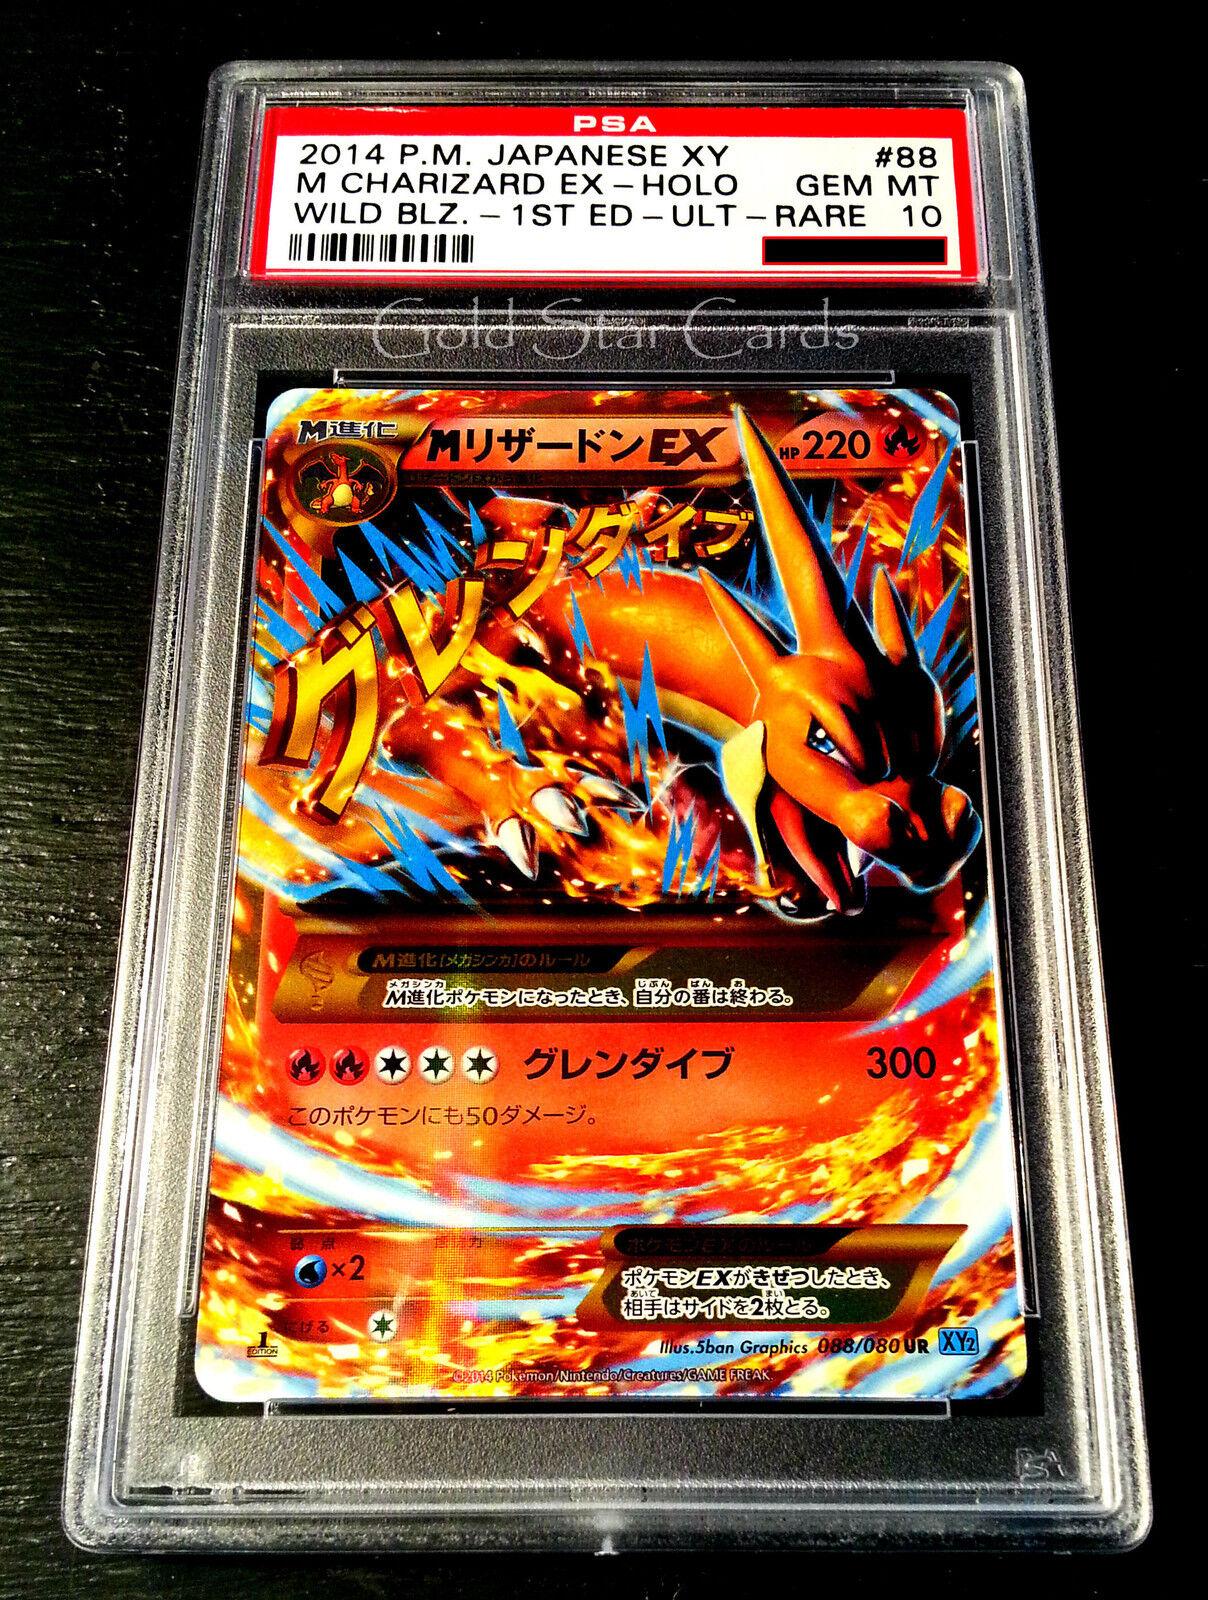 PSA 10 10 10 GEM MINT Mega Charizard EX XY2 Wild Blaze 088 080 JPN 1st Ed Pokemon Card e9c485